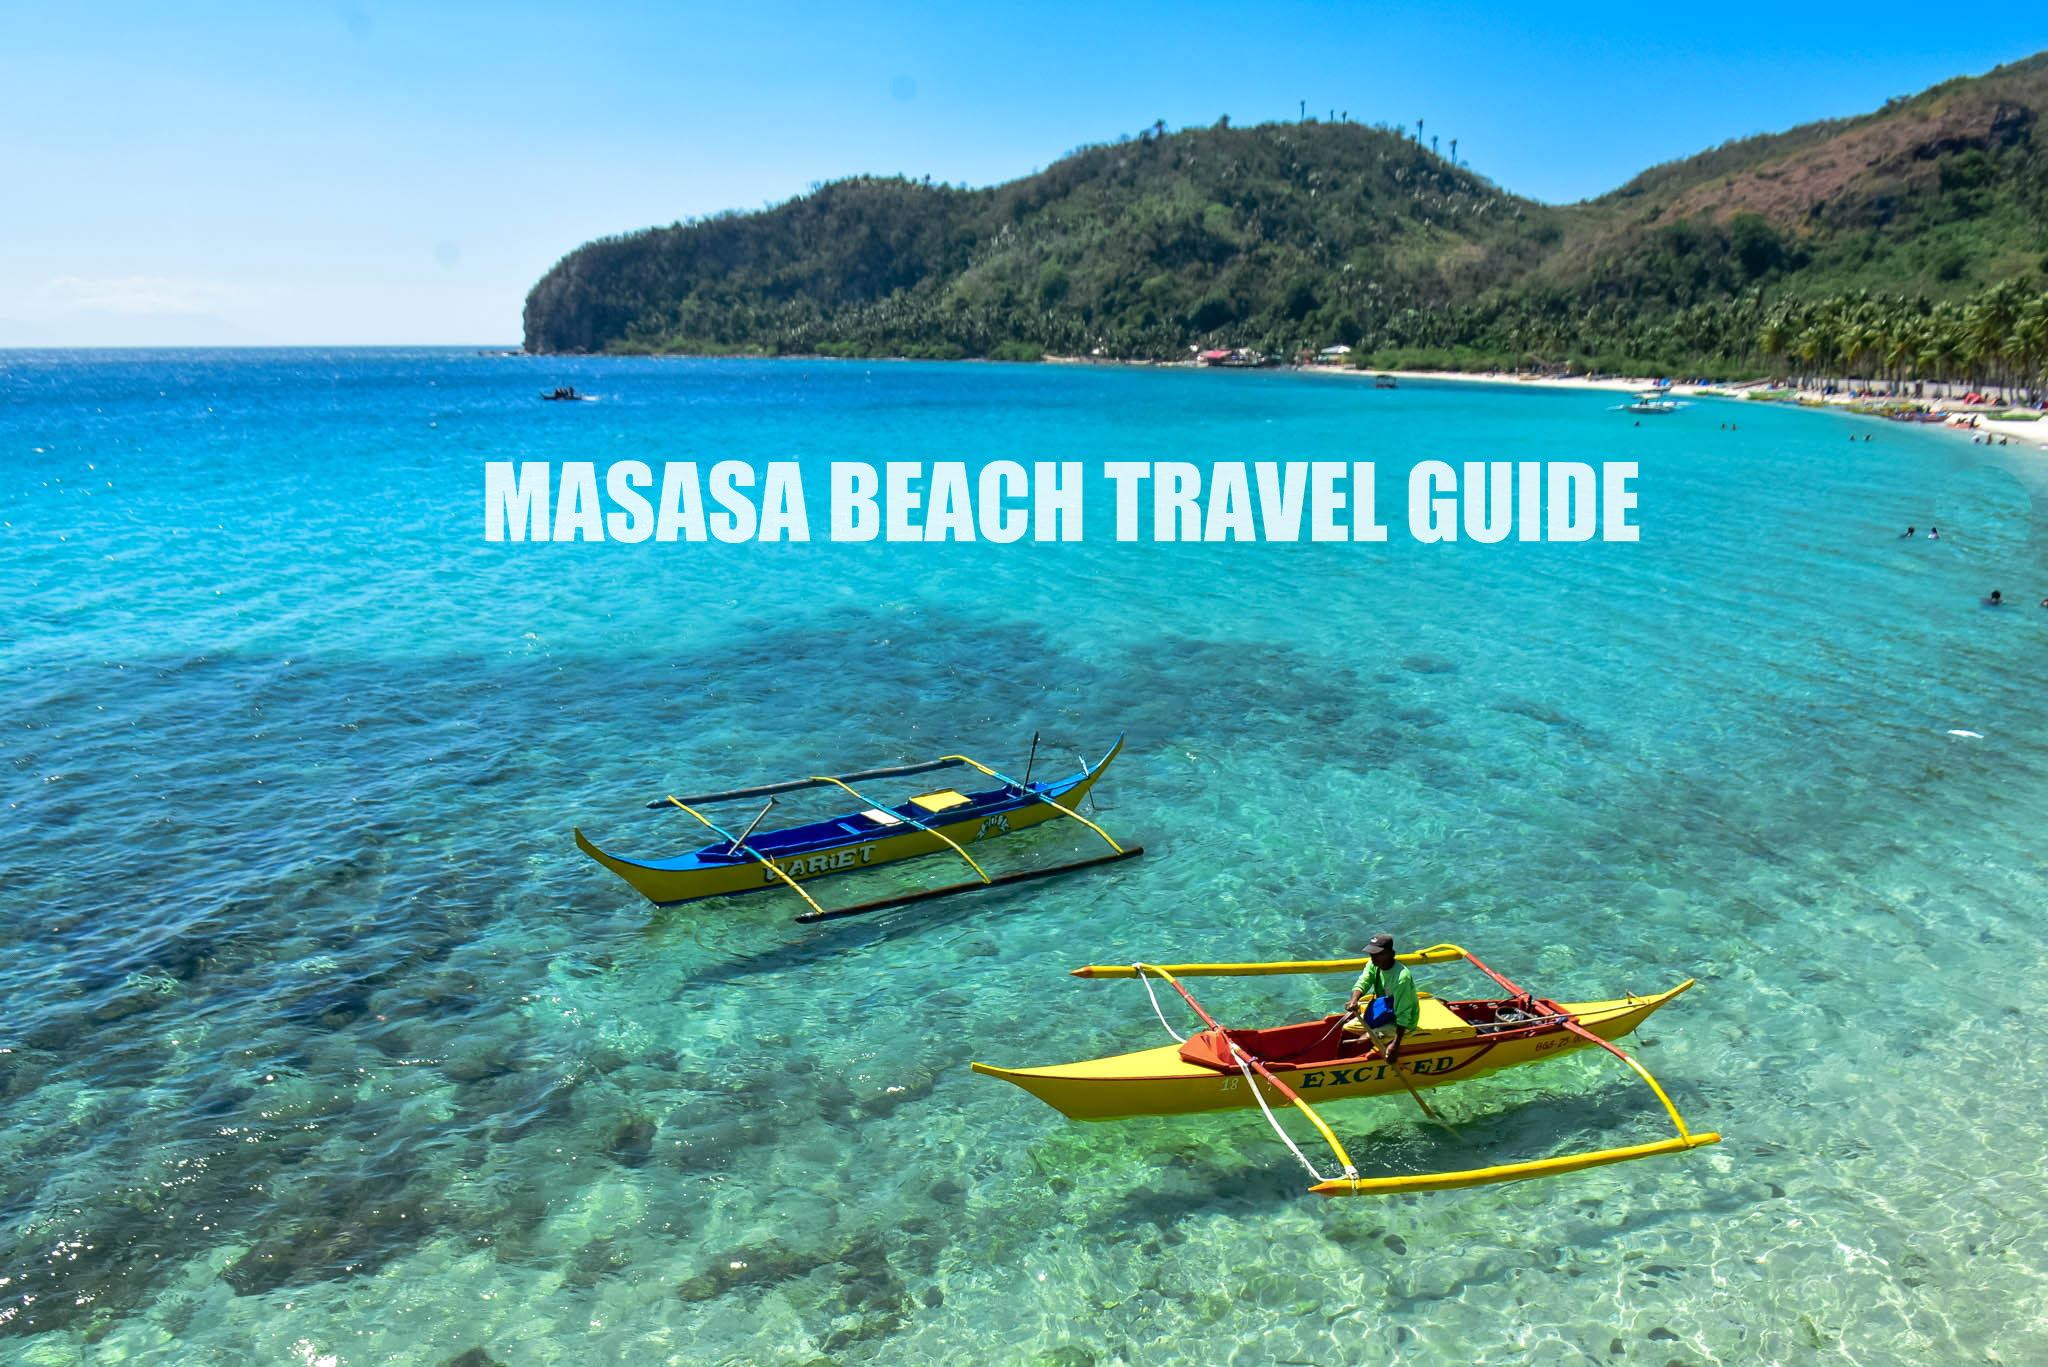 MASASA BEACH TRAVEL GUIDE 2018 (Budget + Itinerary)